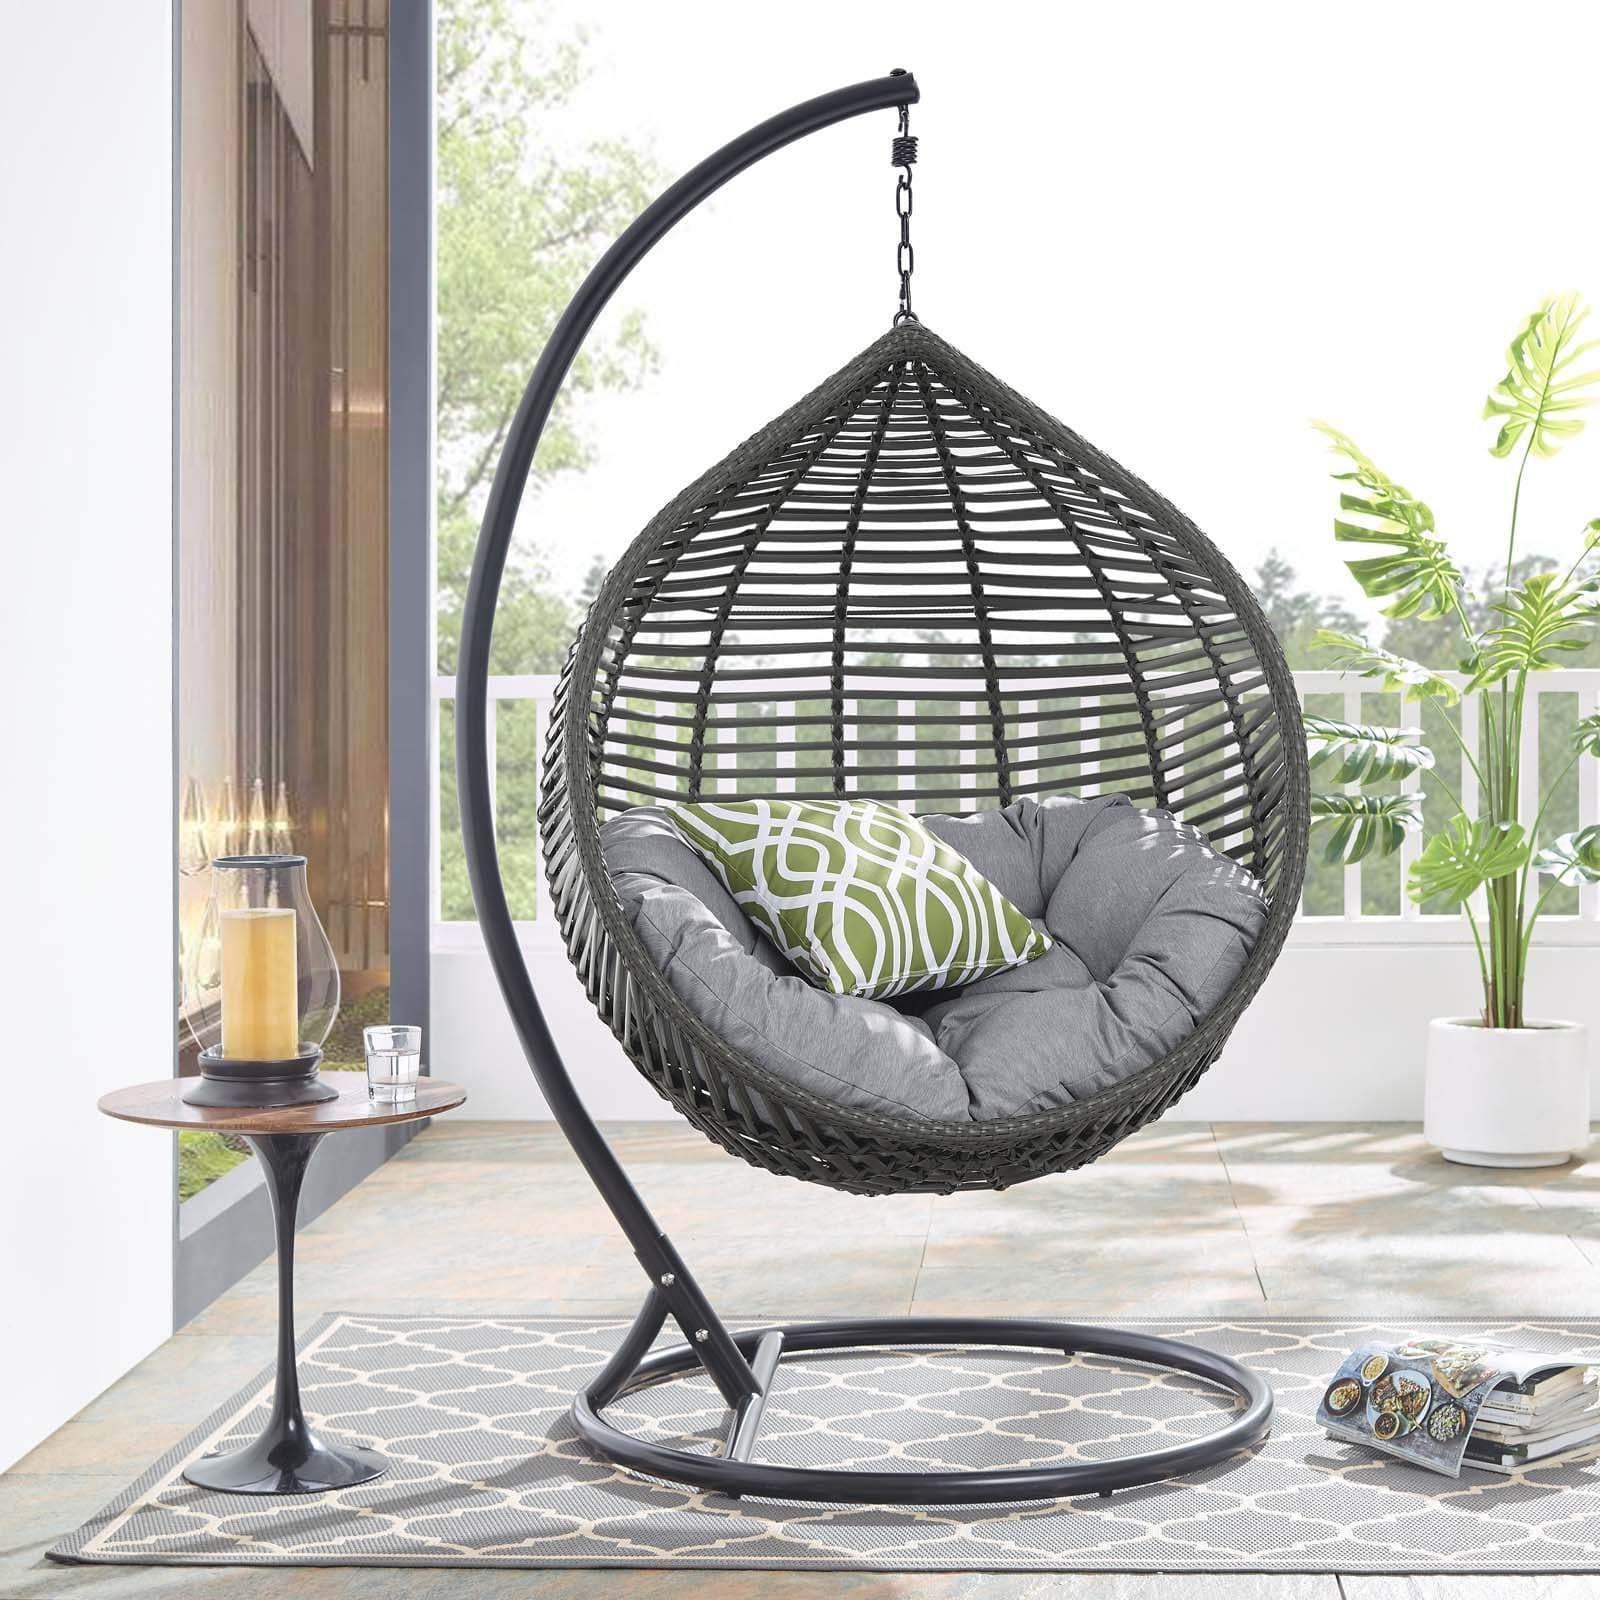 Modway Garner Teardrop Outdoor Patio Swing Chair Patio Swing Chair Outdoor Patio Swing Swing Chair Outdoor Outdoor patio swing chair